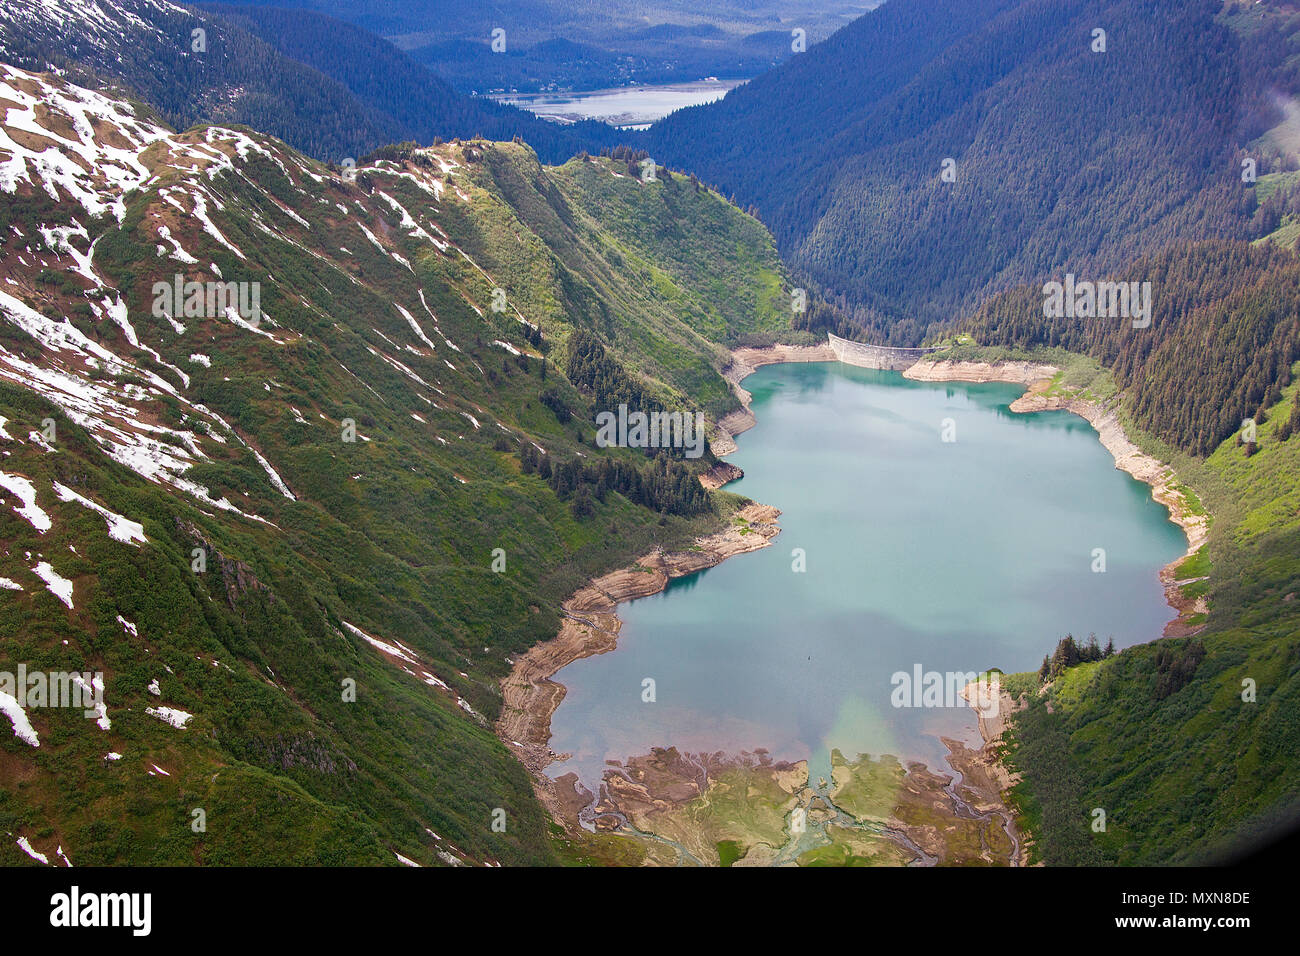 Gletschersee am Mendenhall-Gletscher, Juneau, Alaska, Nordpazifik, USA   Glacier lake at Mendenhall glacier, Alaska, North Pacific, USA - Stock Image